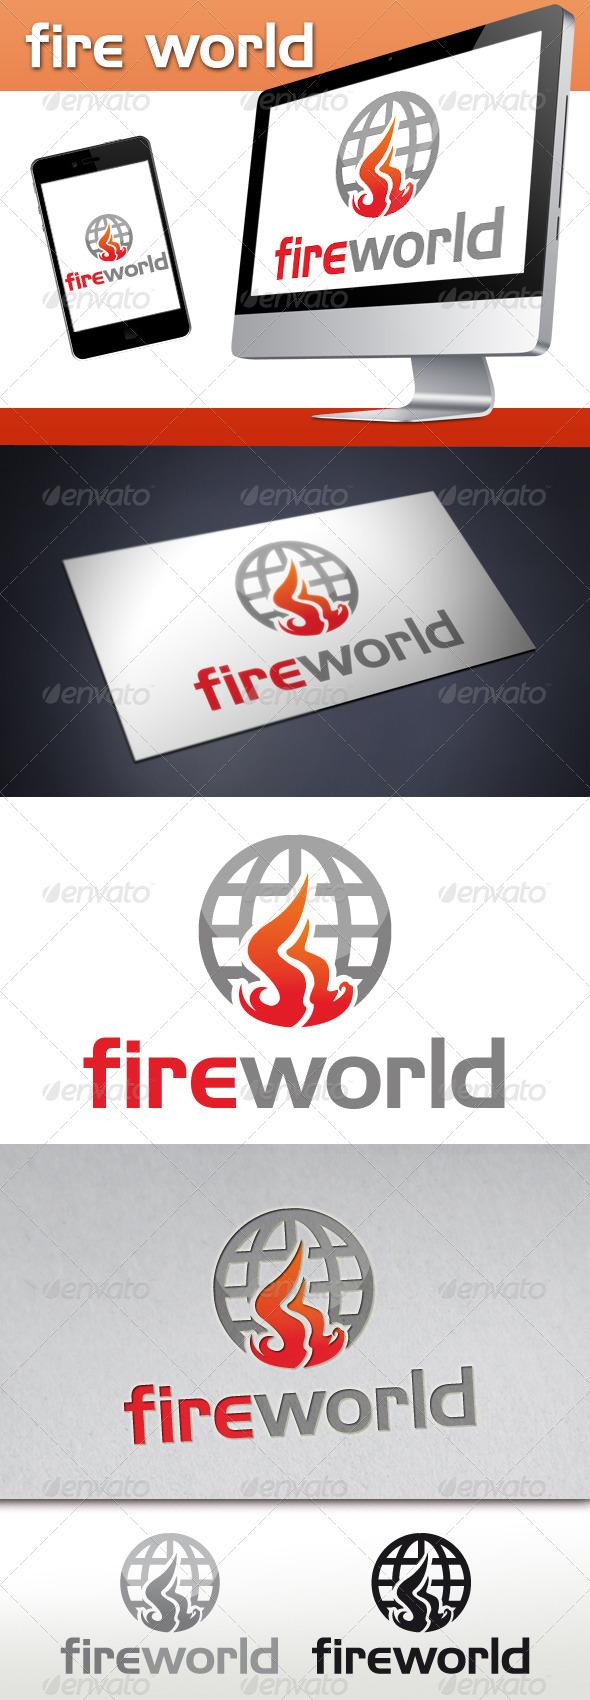 Fire World Media Logo